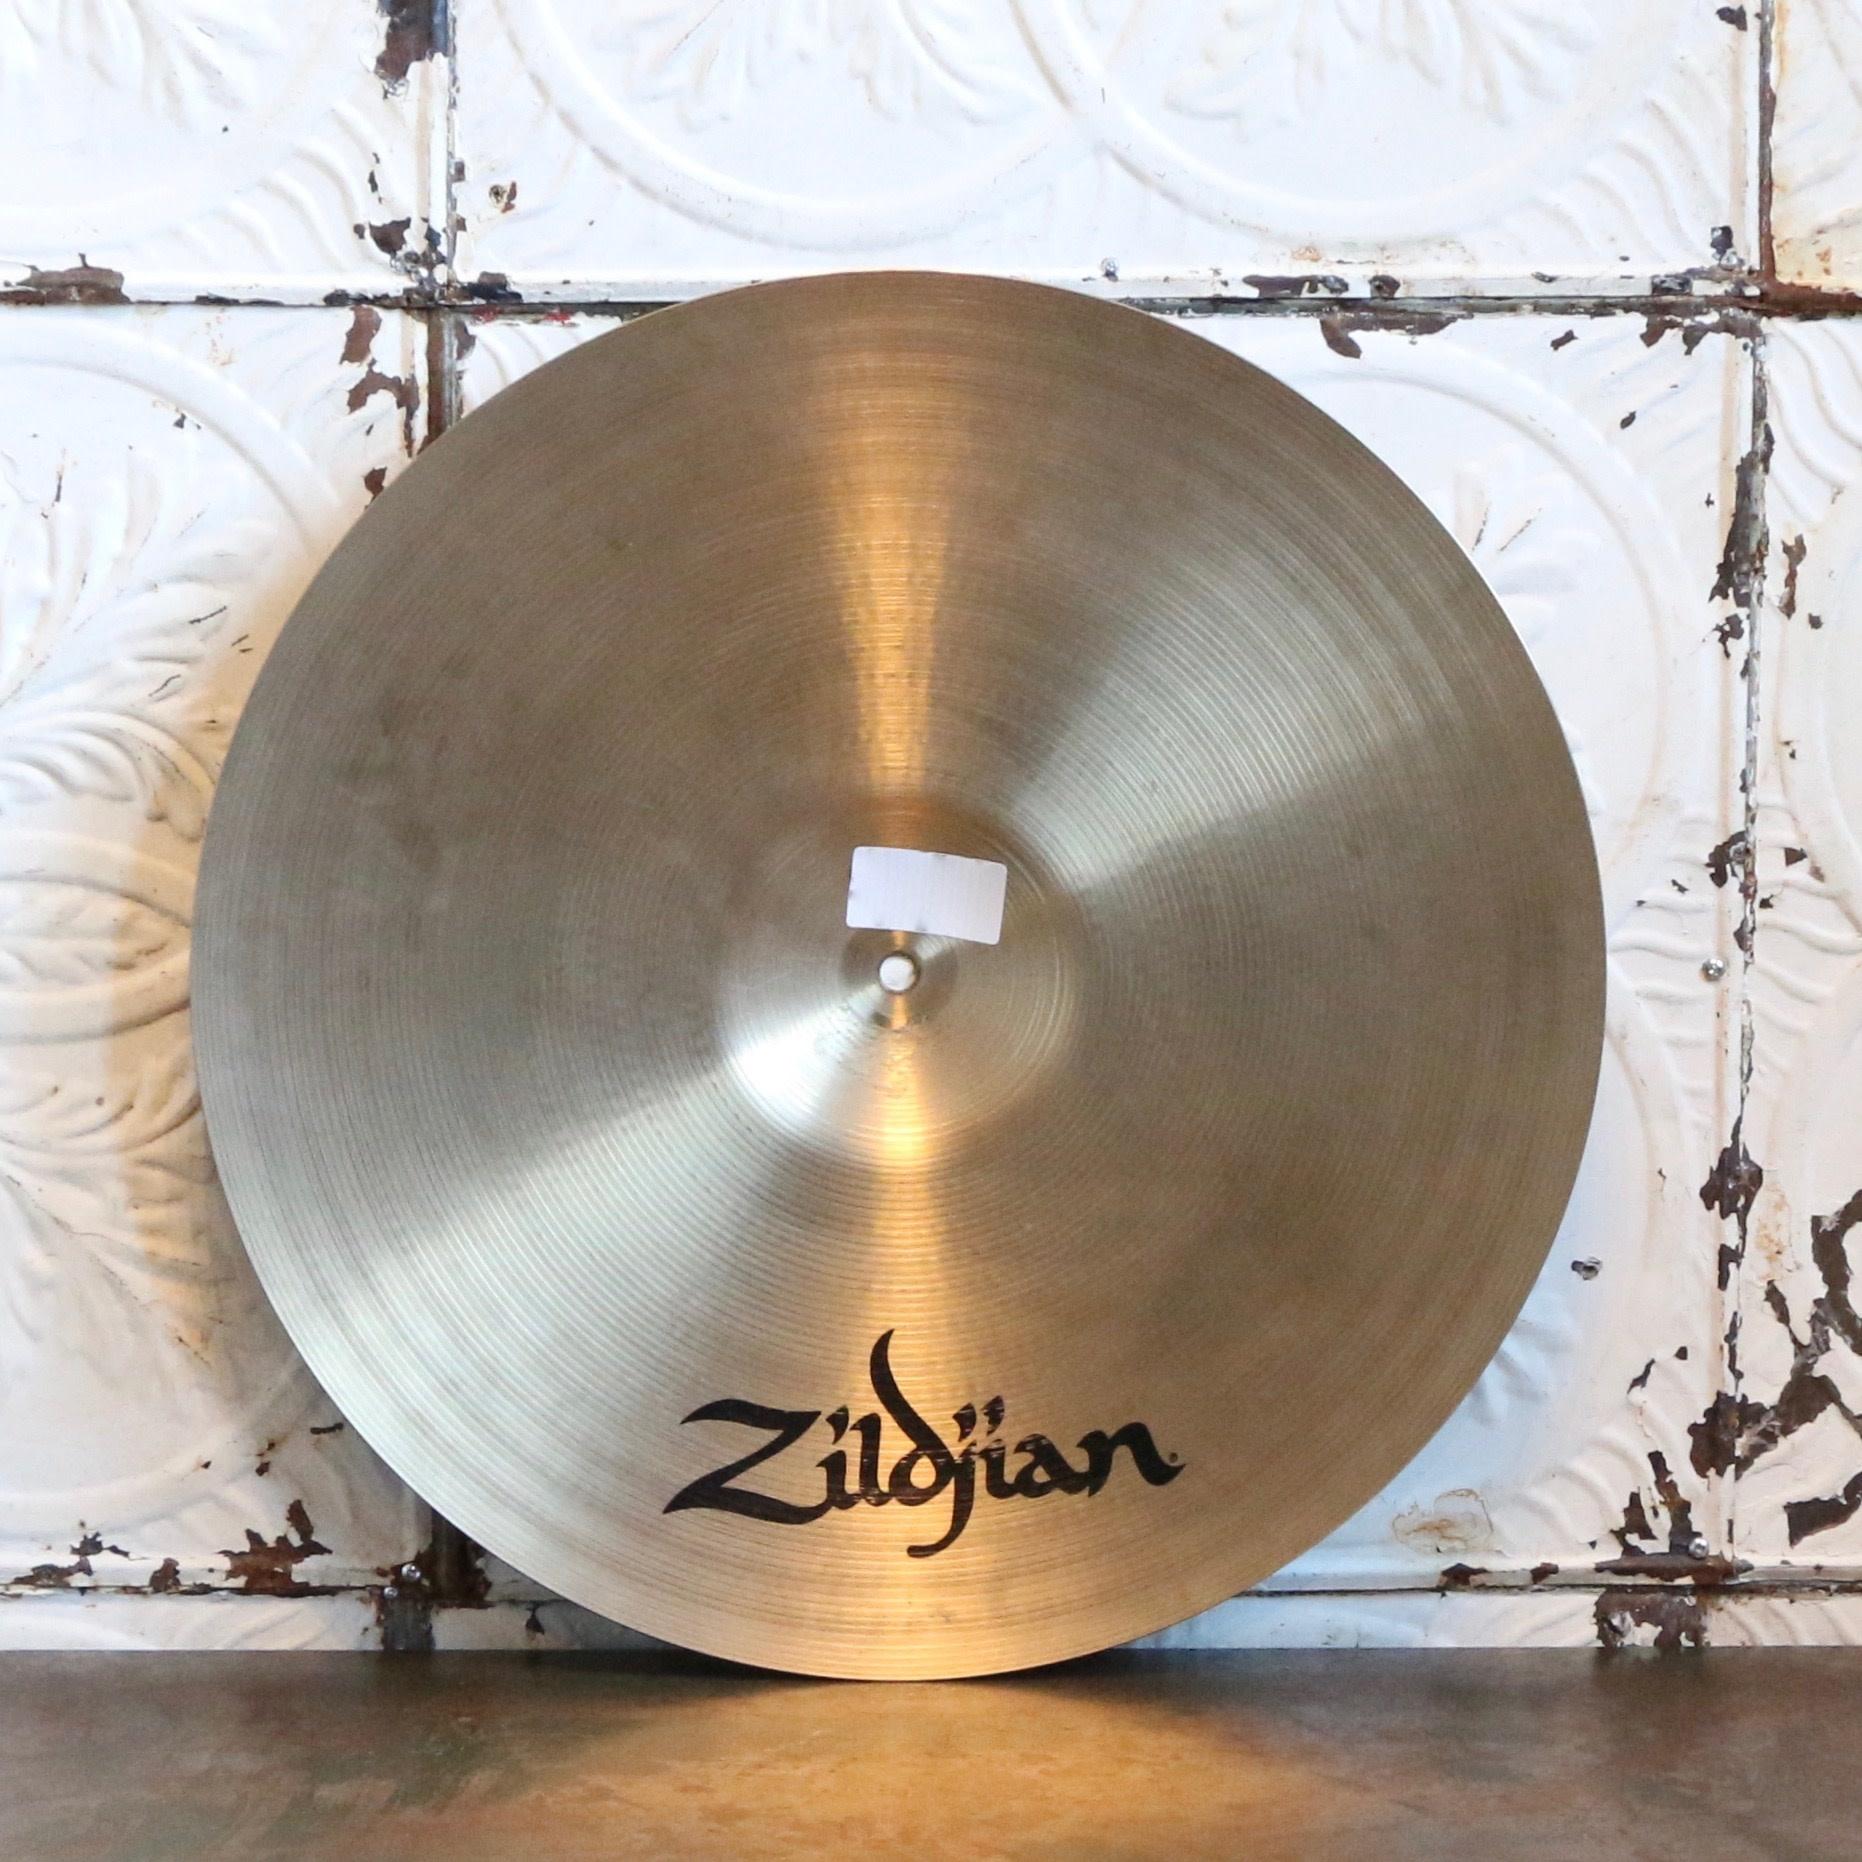 Zildjian Cymbale usagée Zildjian A Medium Ride 20po